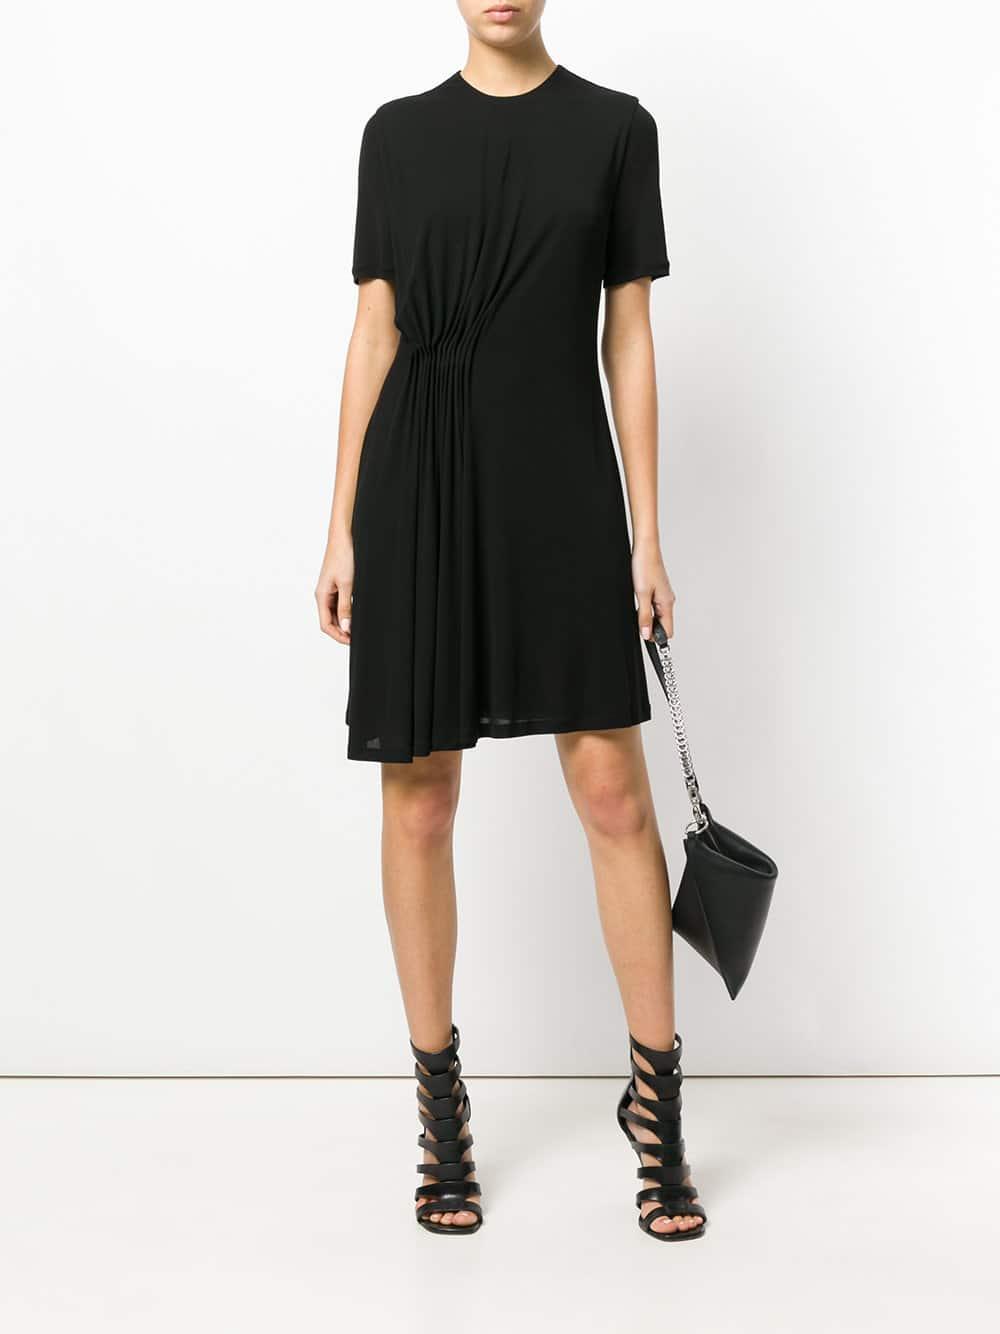 GIVENCHY Gathered Waist Black Dress